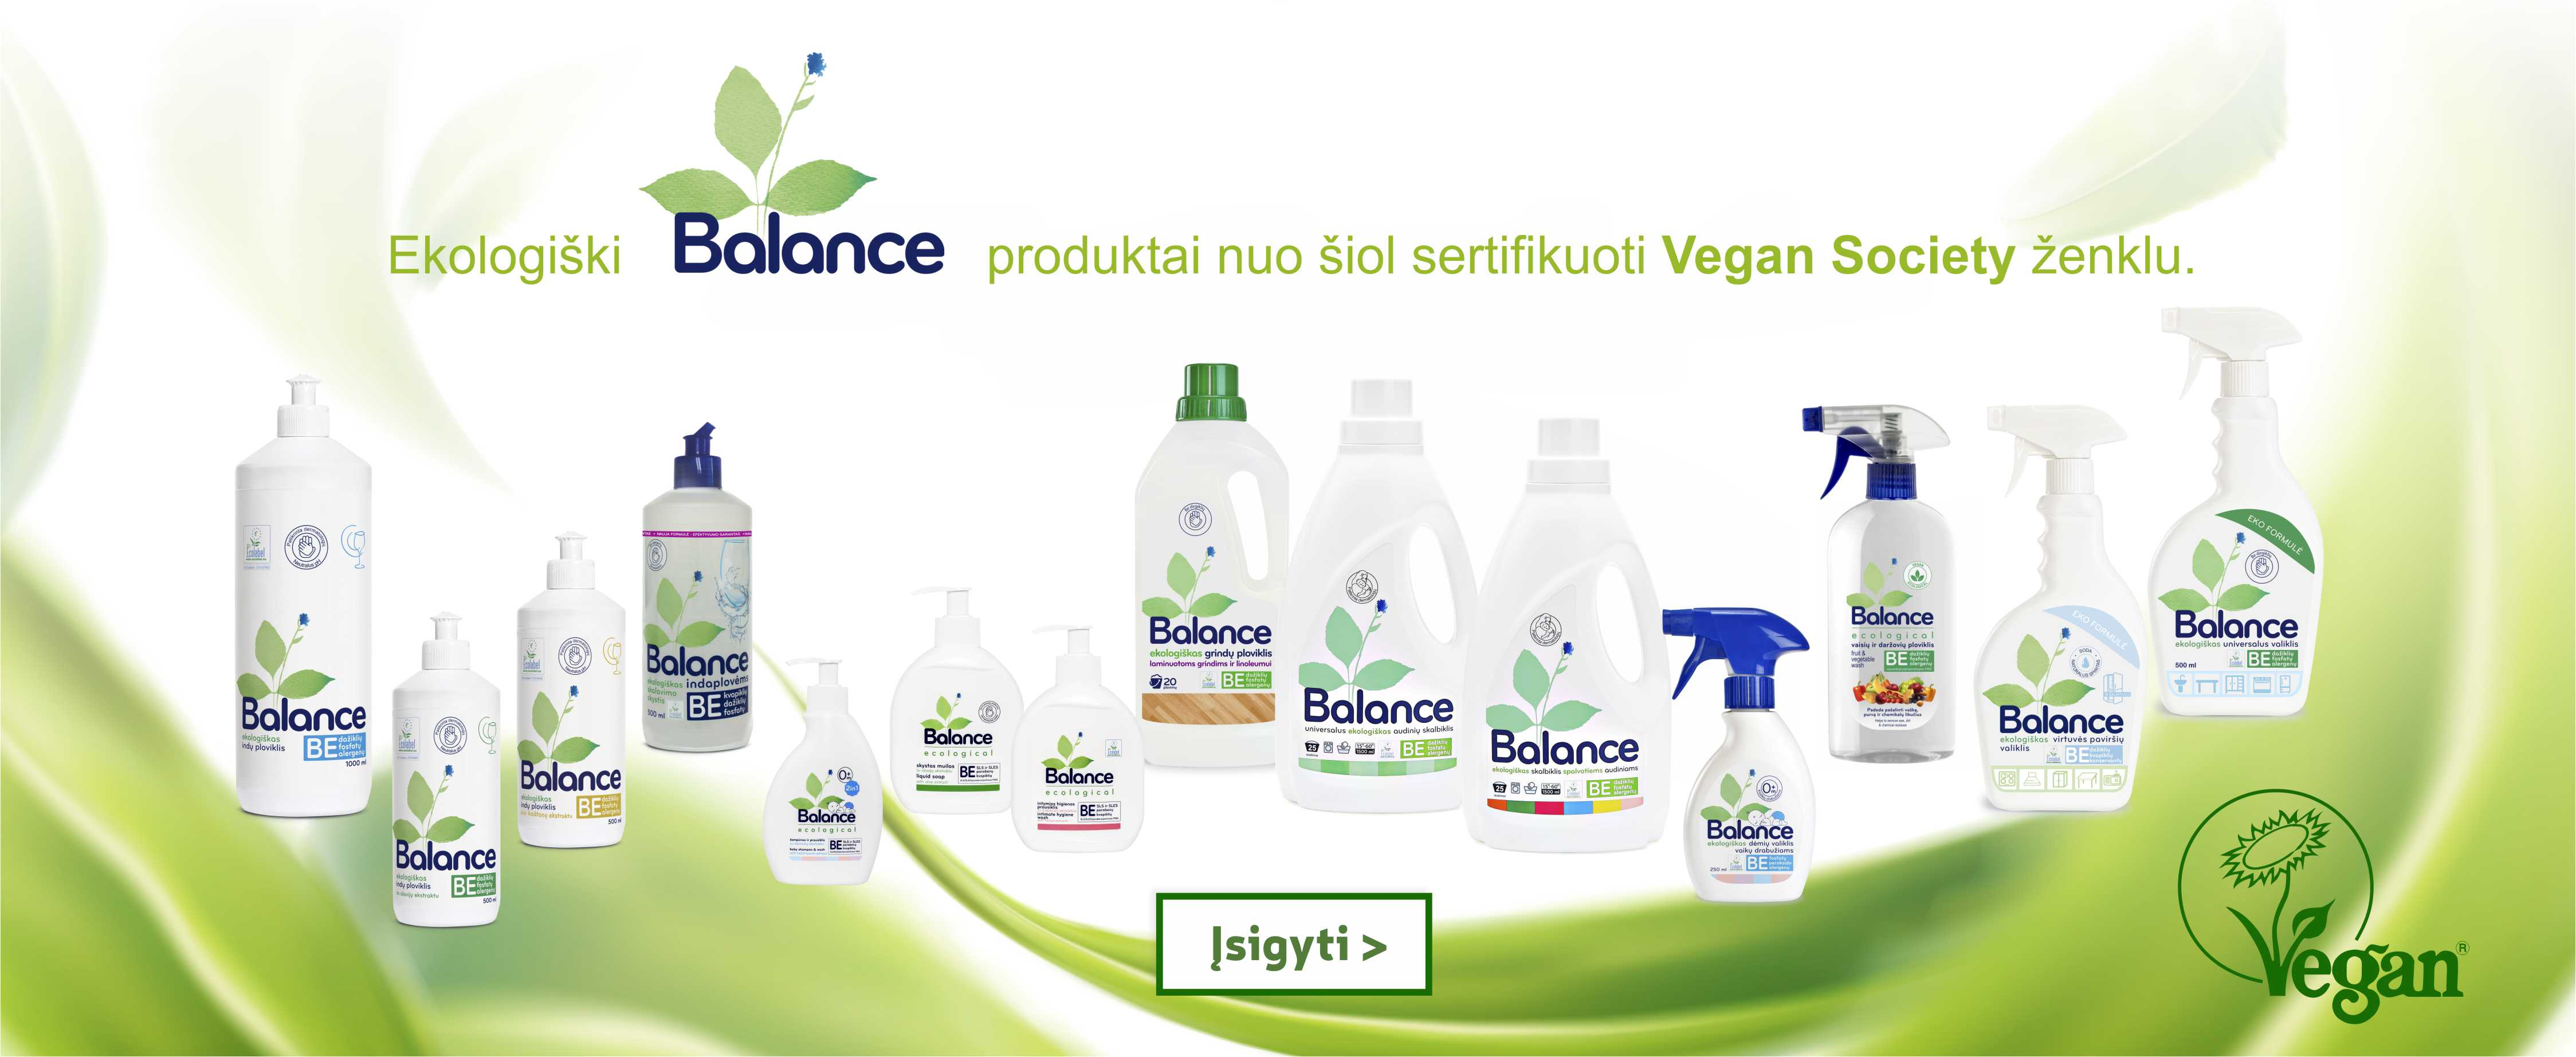 Vegan srtifikatas